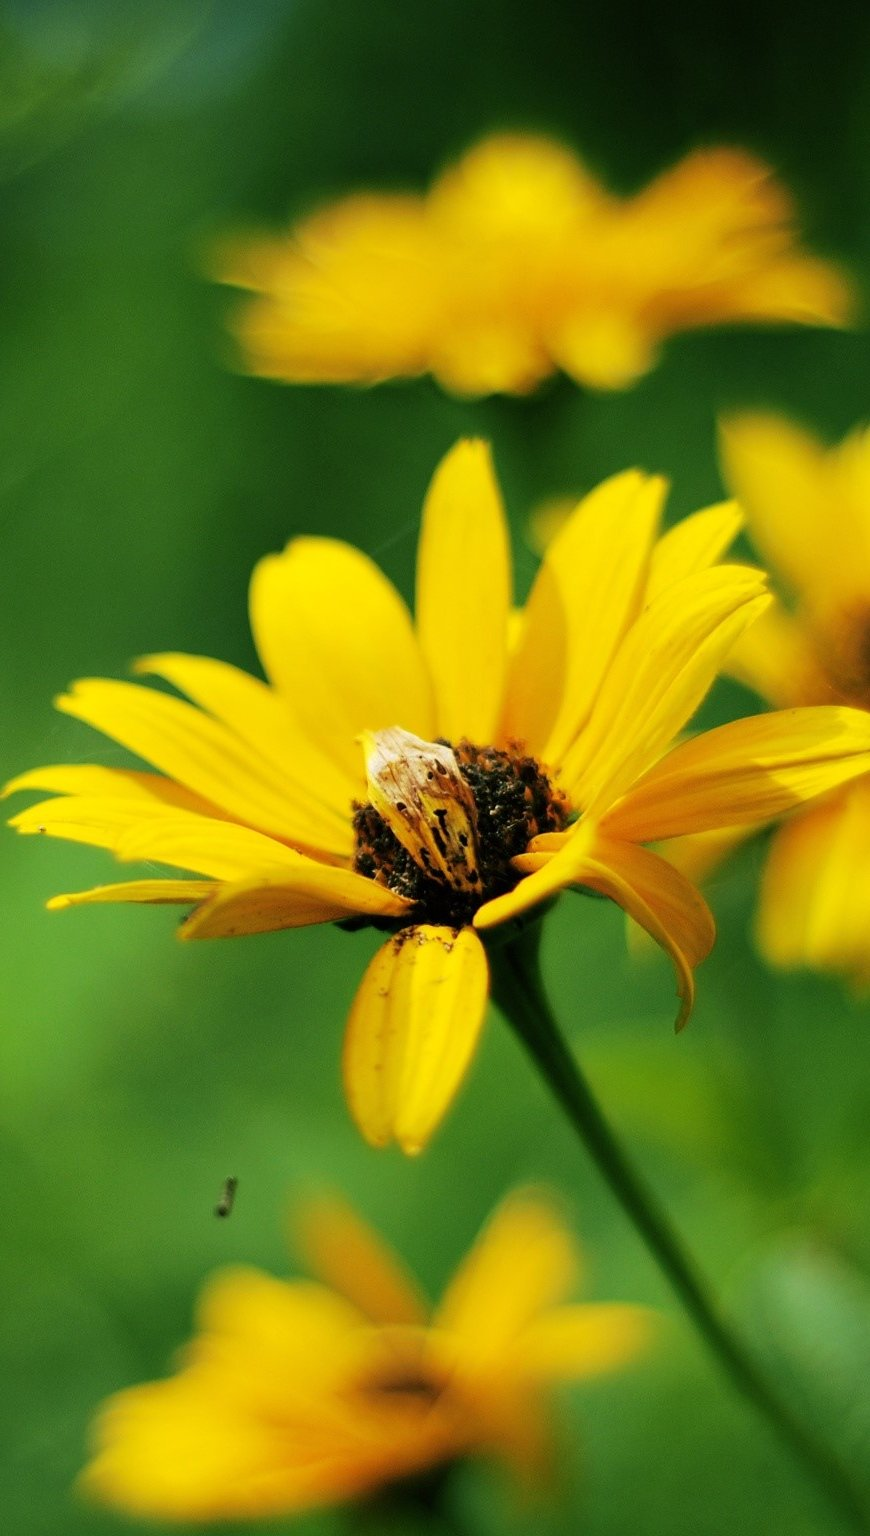 Fondos de pantalla Flores amarillas Vertical